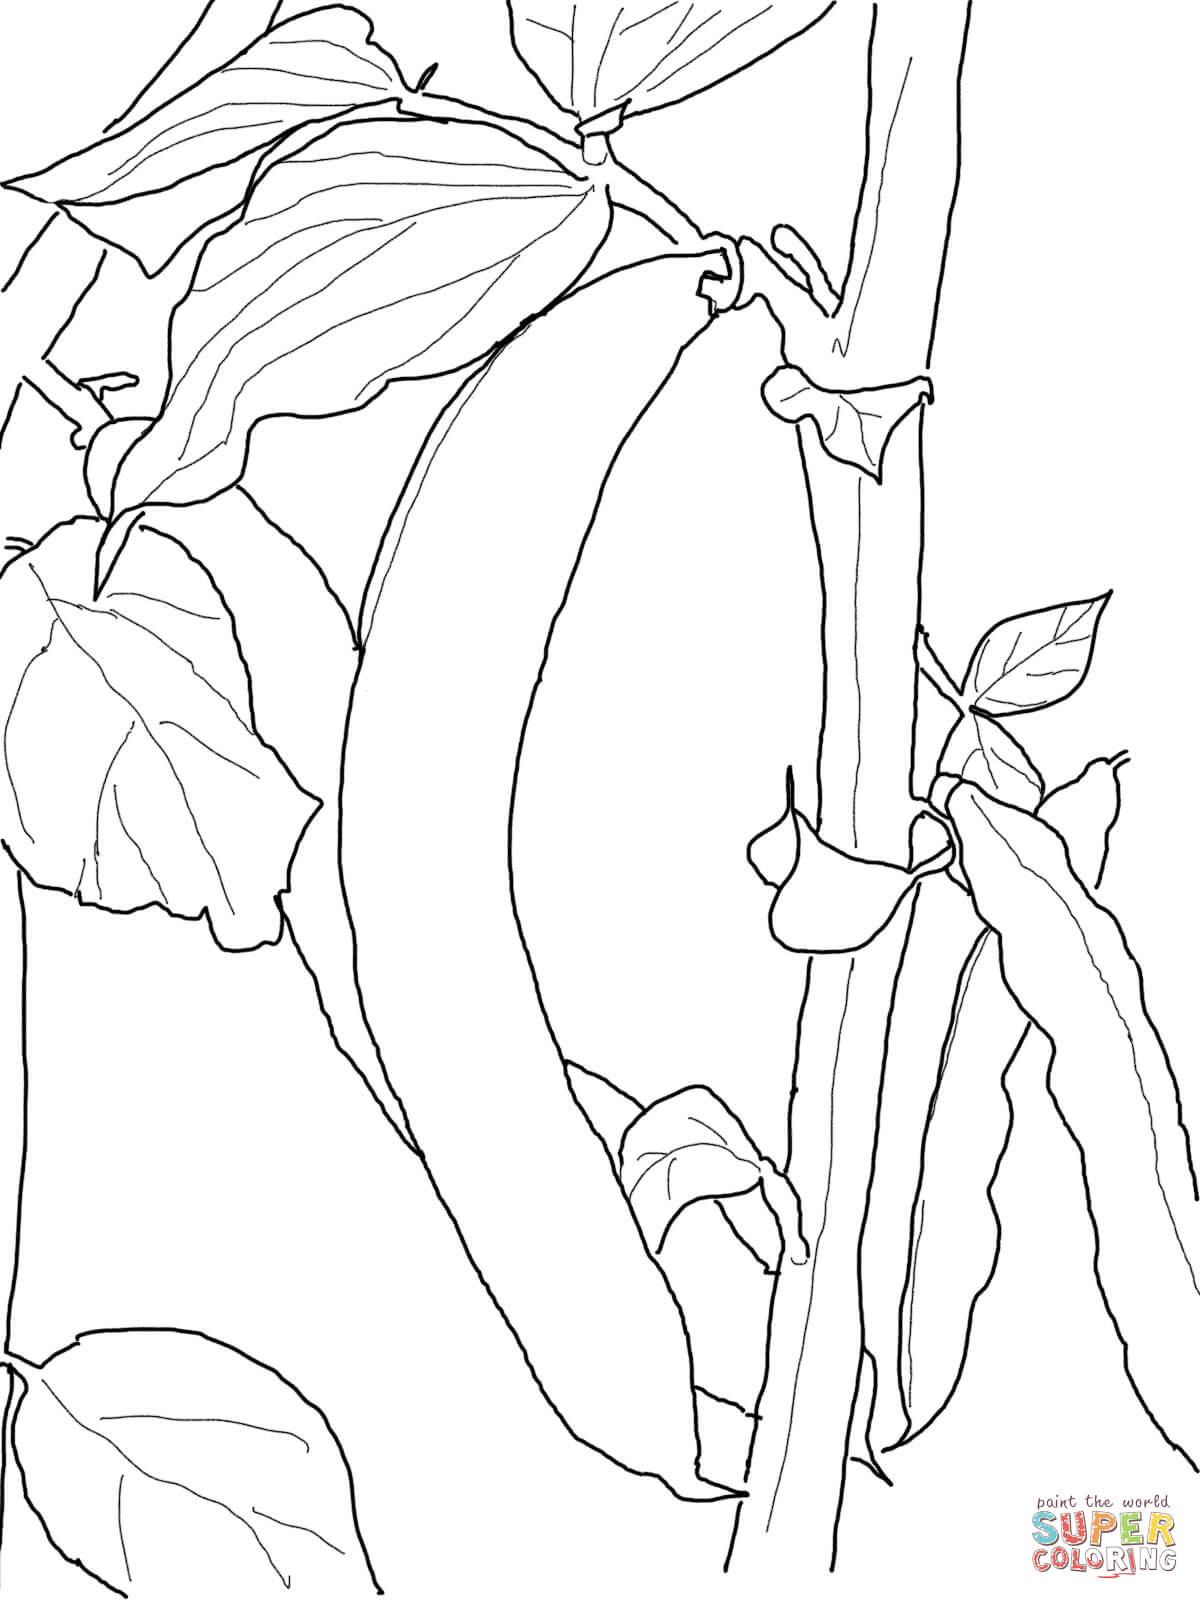 Bean Plant Drawing At Getdrawings